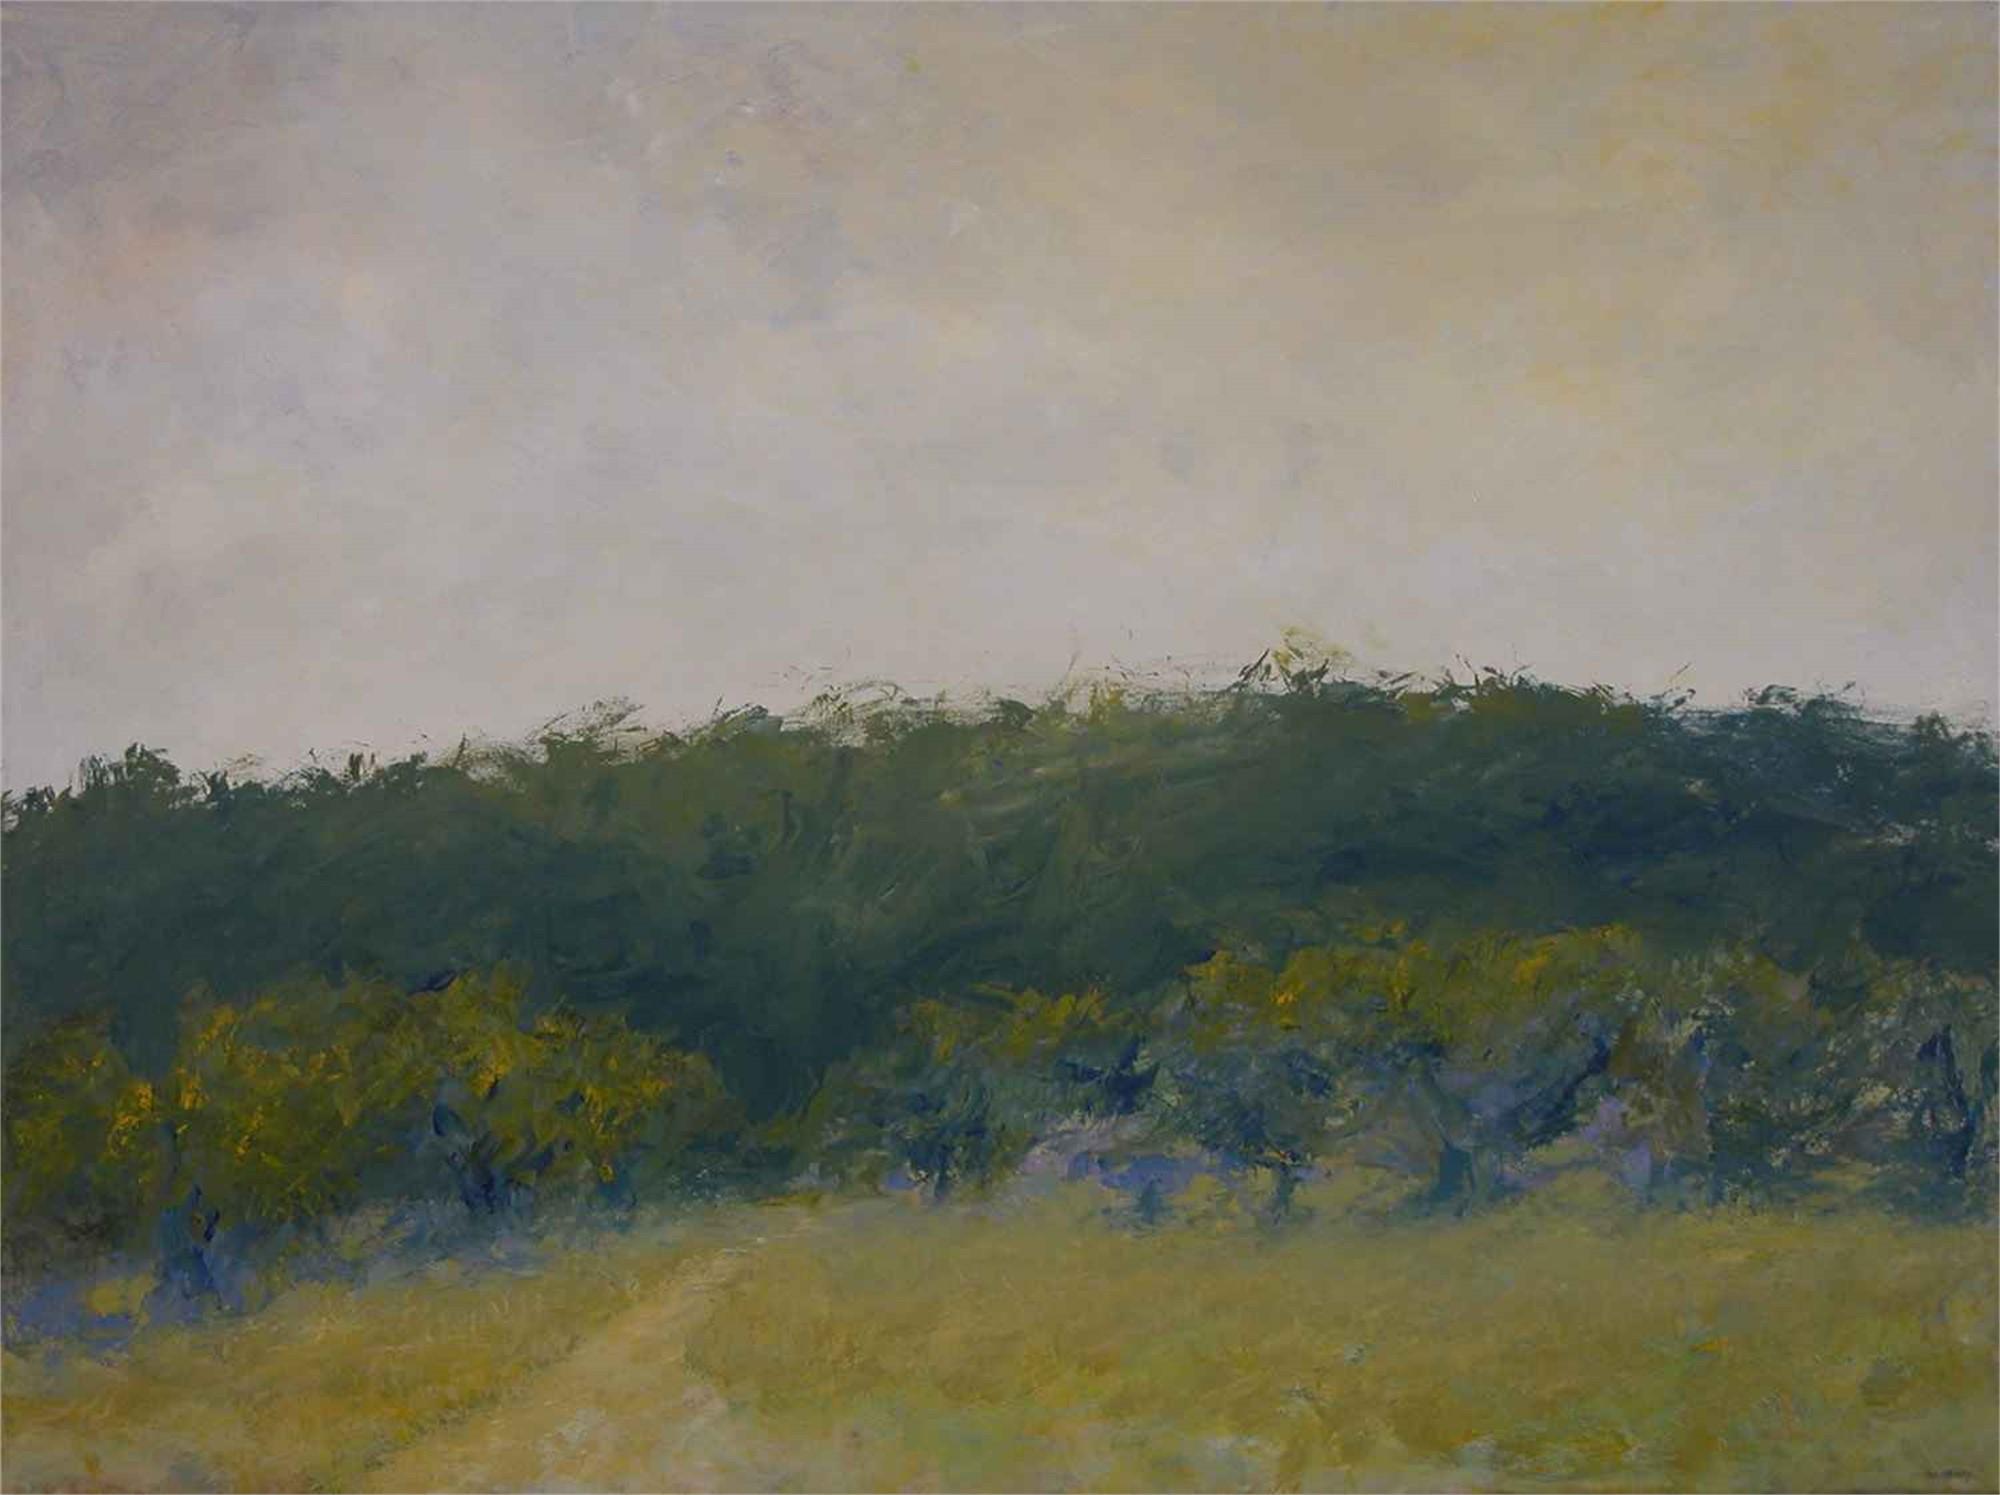 Summer Orchard by John Gaitenby